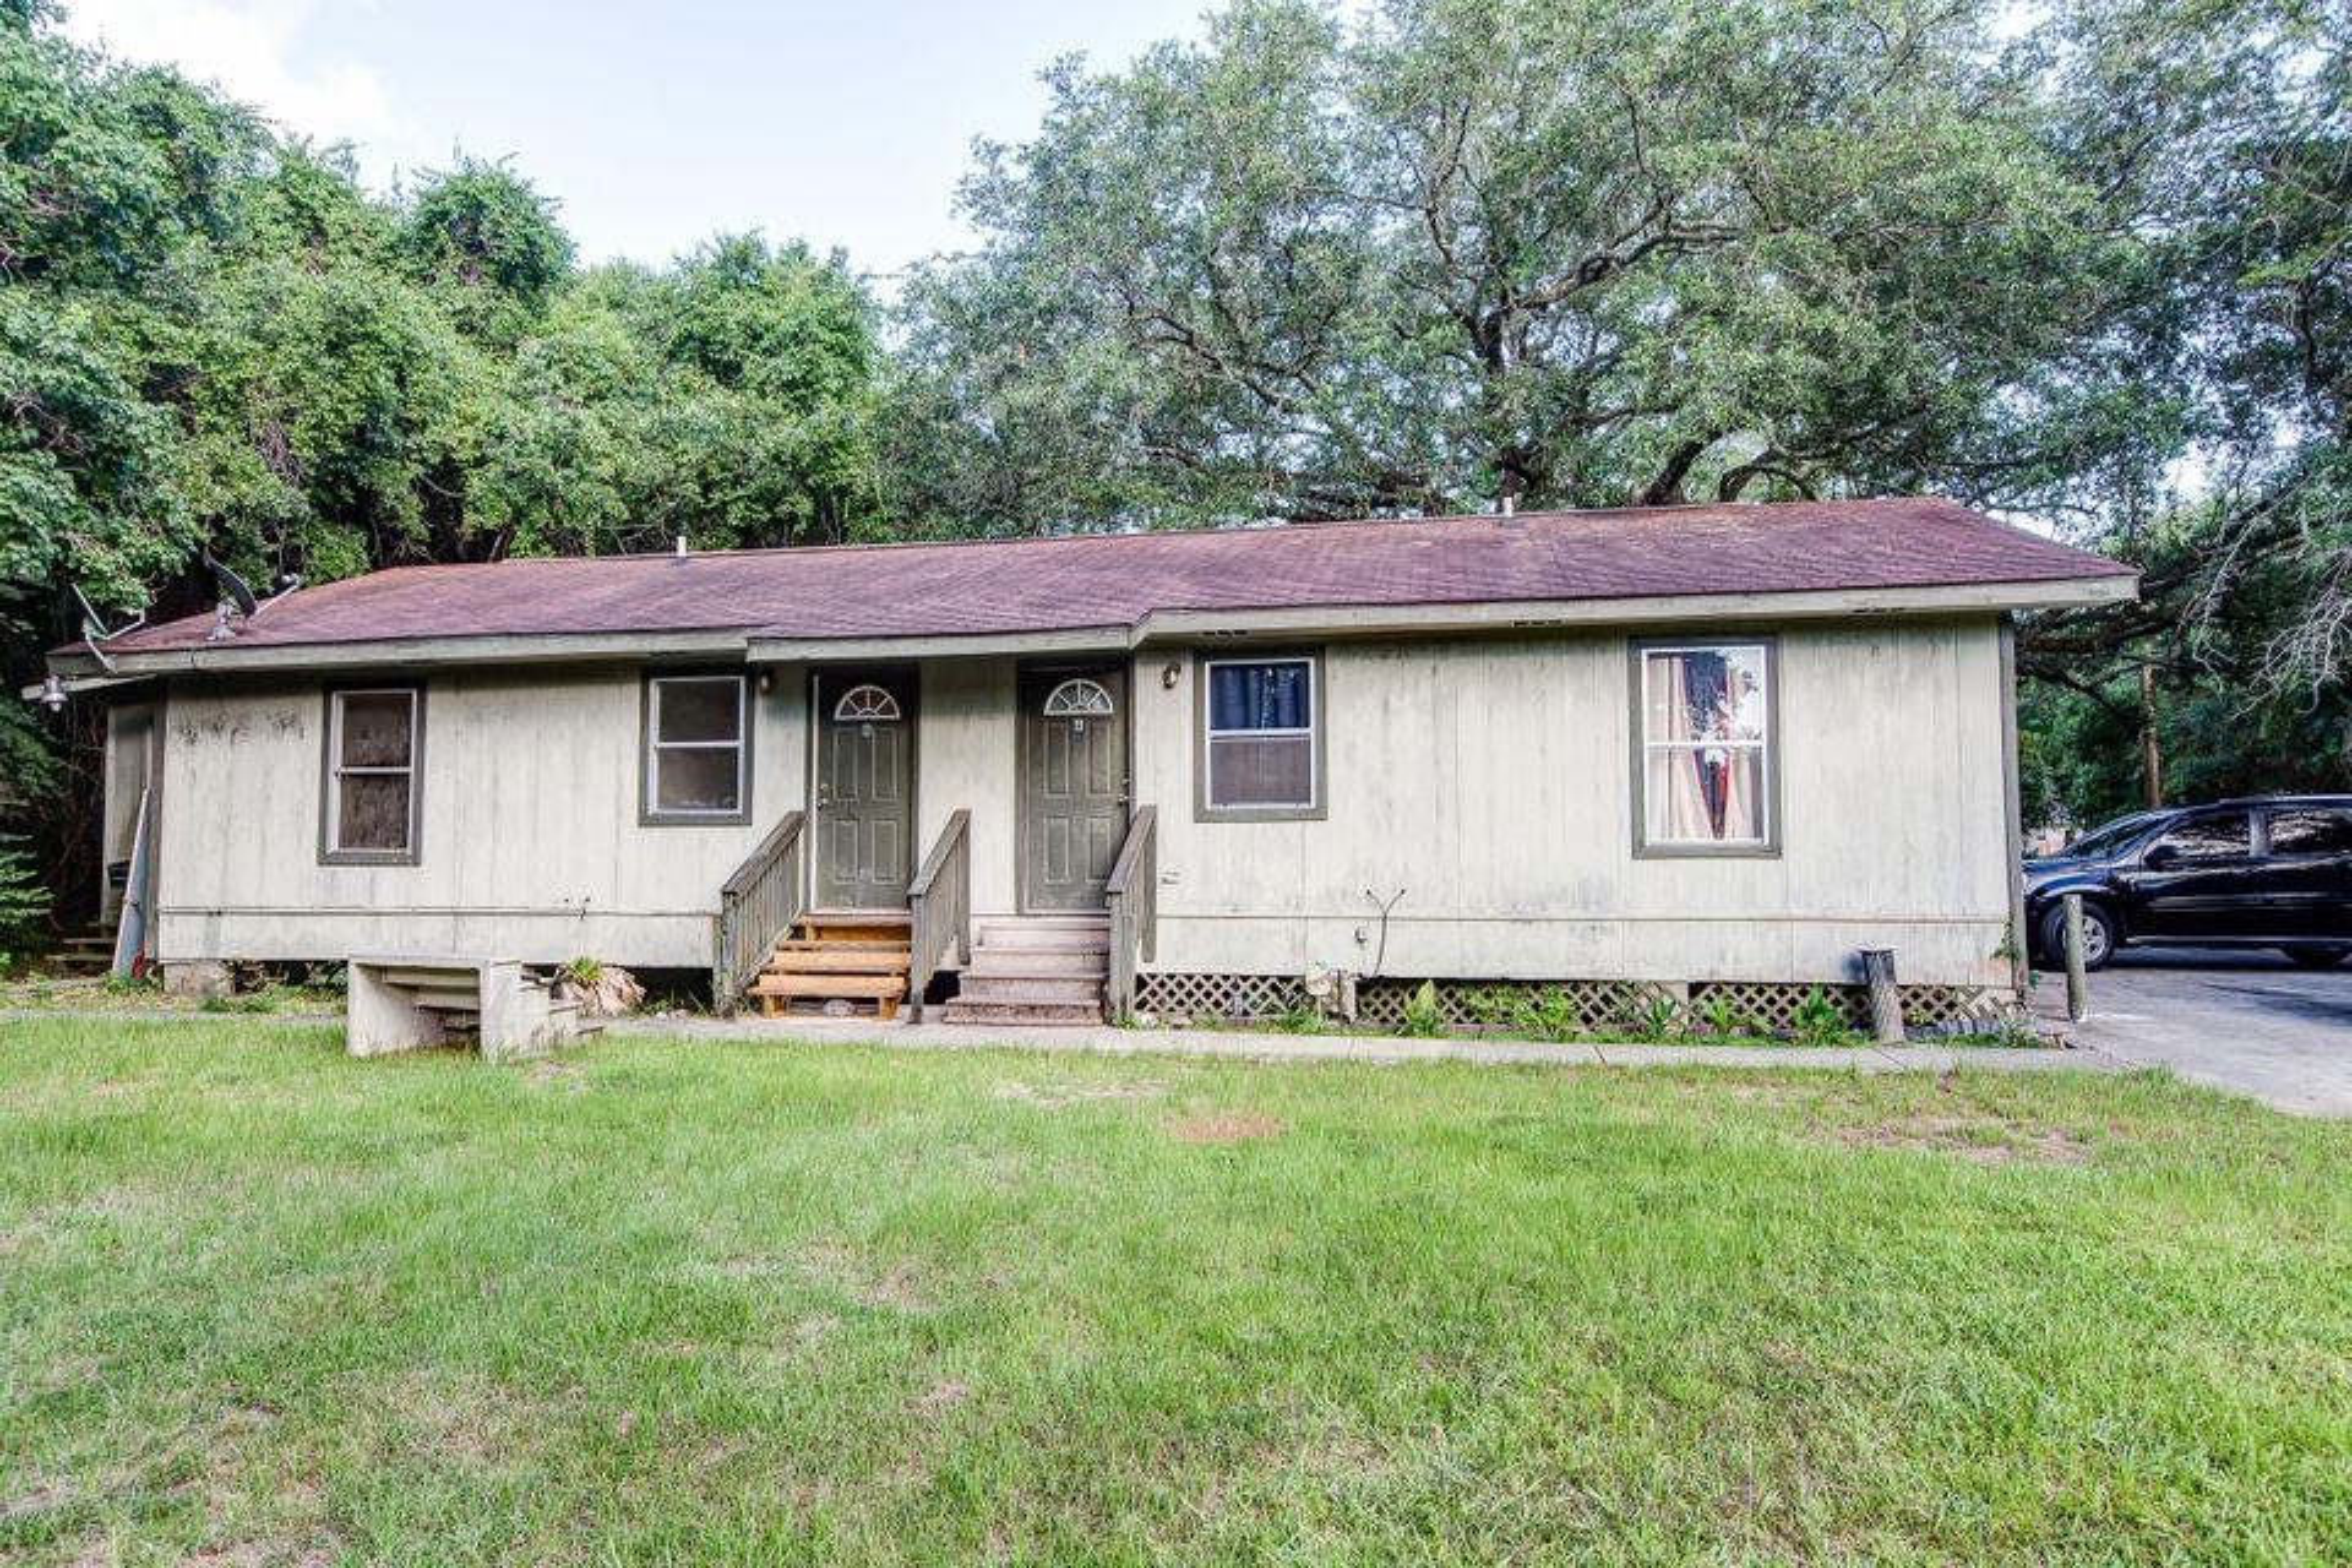 1216 Hardy Ave,Gulfport,Mississippi 39501,Multi-Family,Hardy,335695